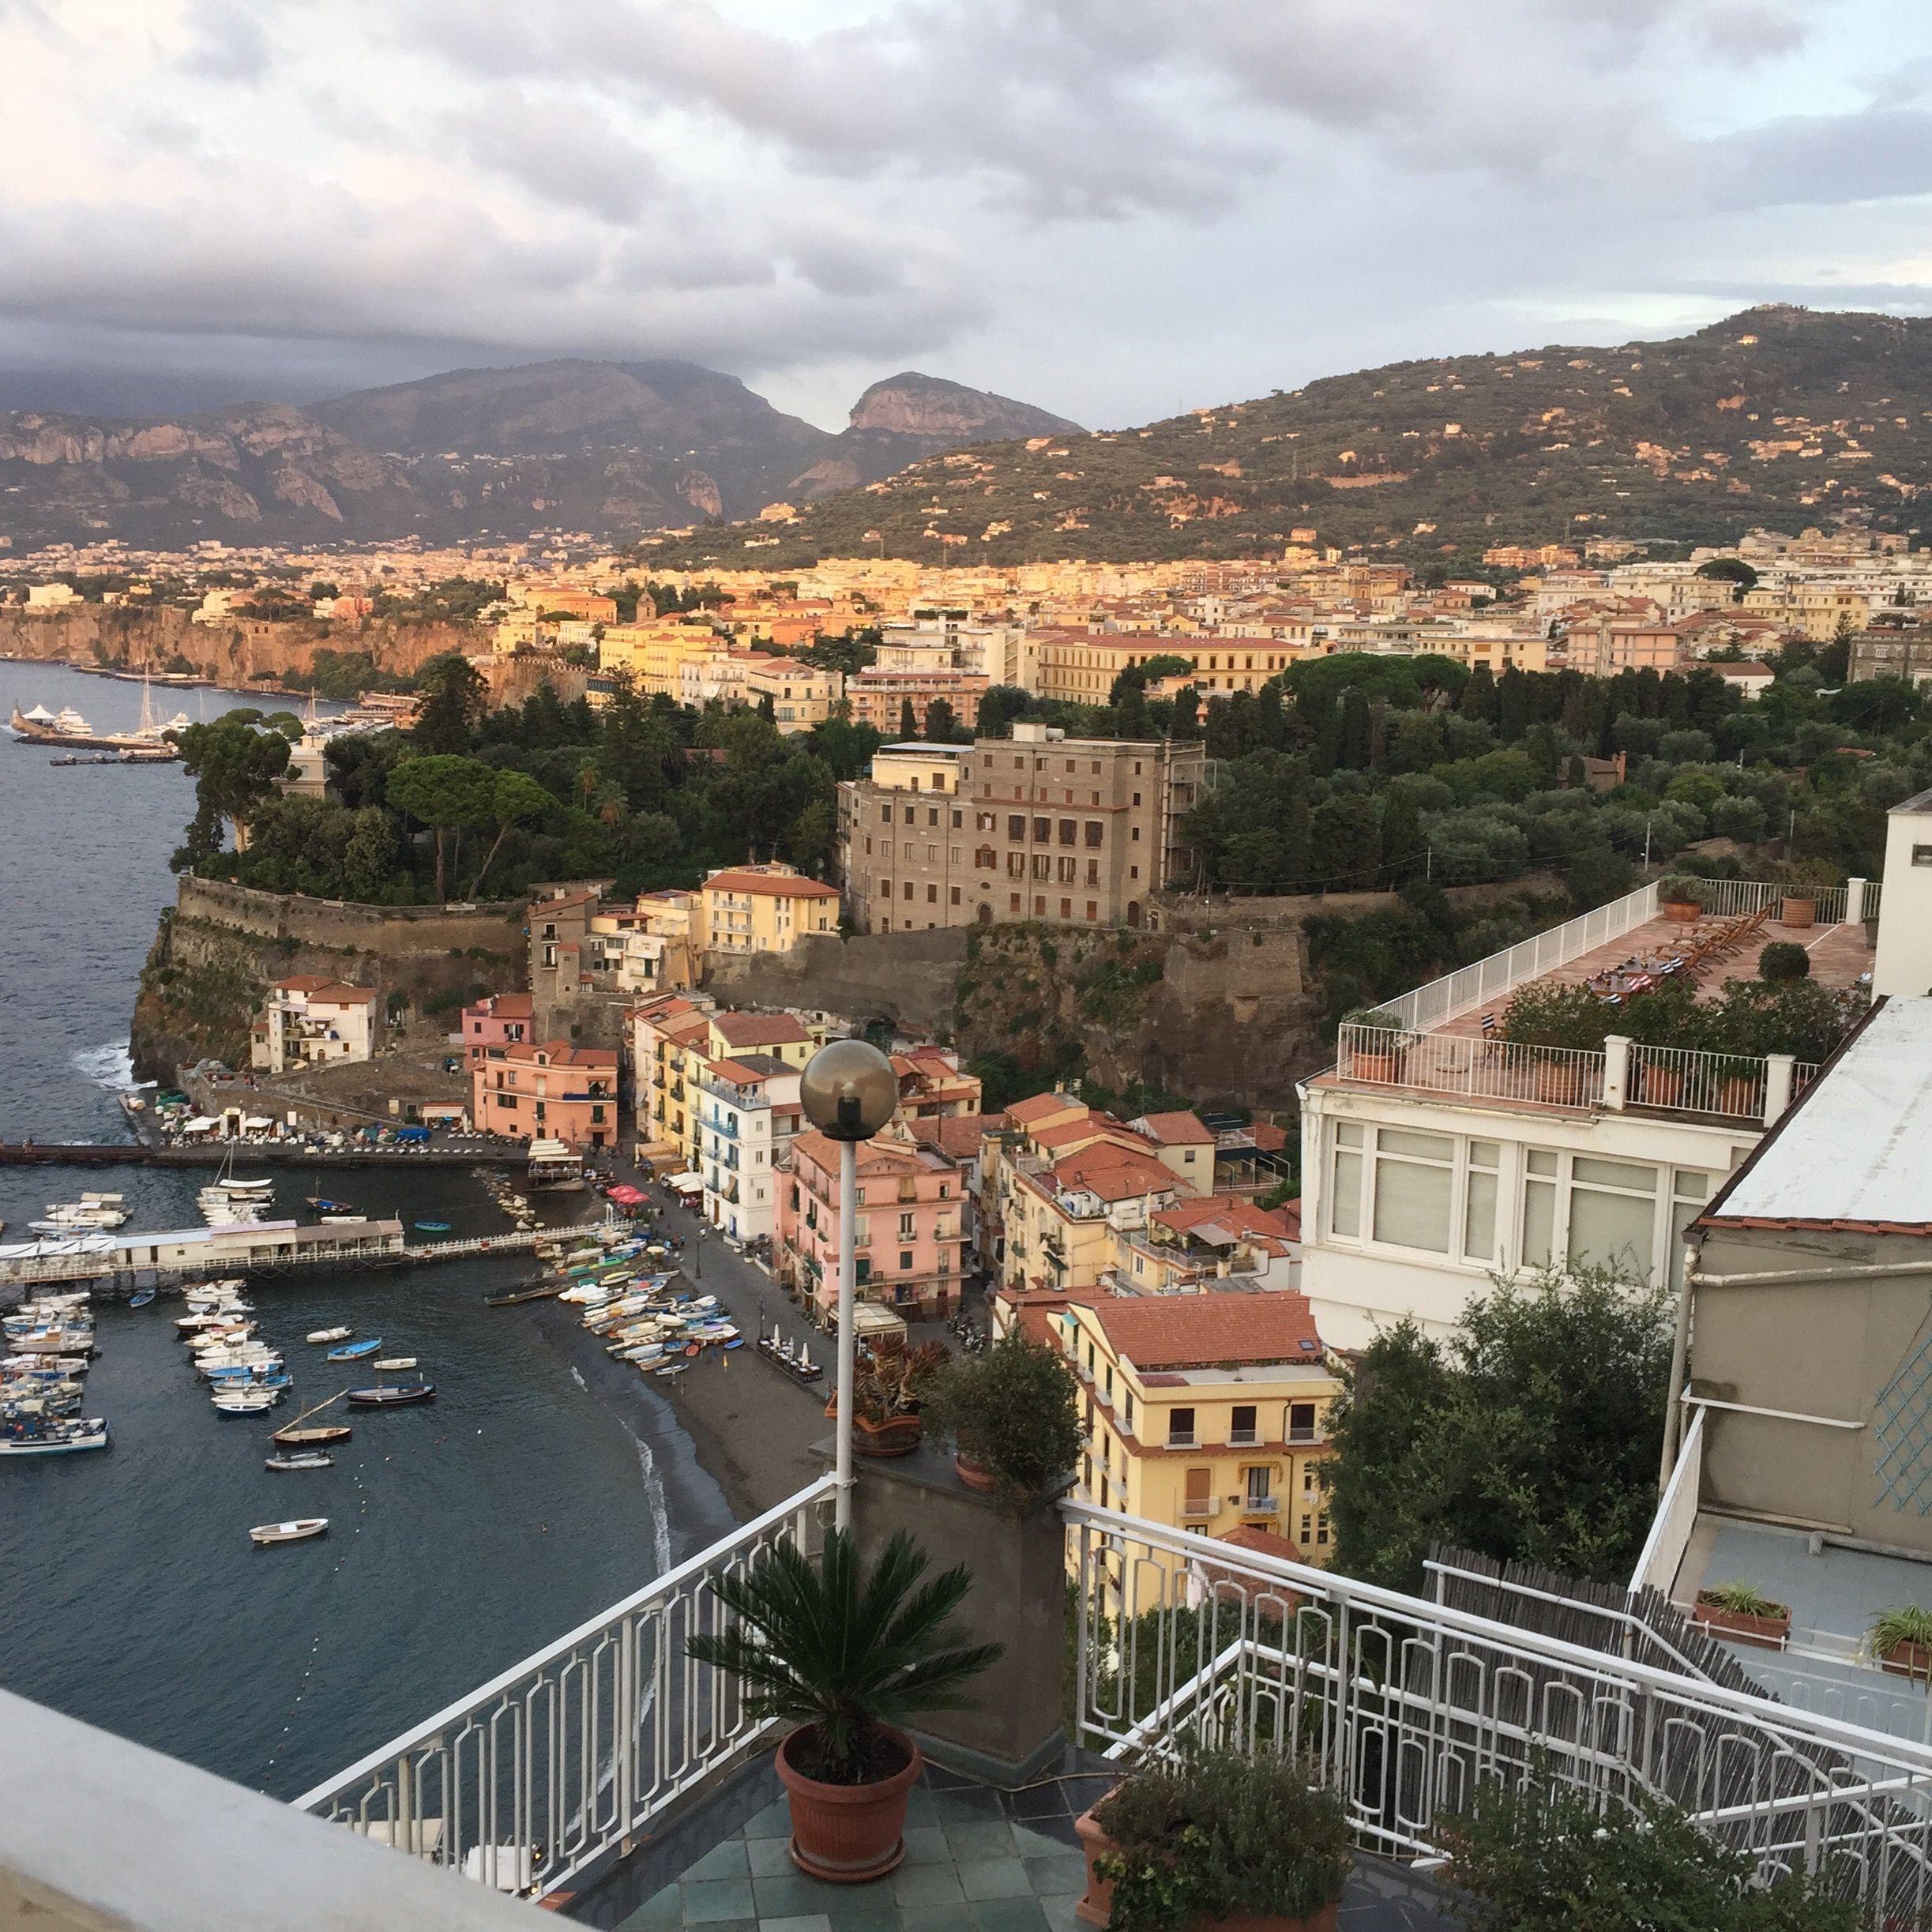 Sorrento, Italy Italy Is Always A Good Idea @https://www.amodeltraveler.com/single-post/2016/12/28/Italy-Is-Always-A-Good-Idea